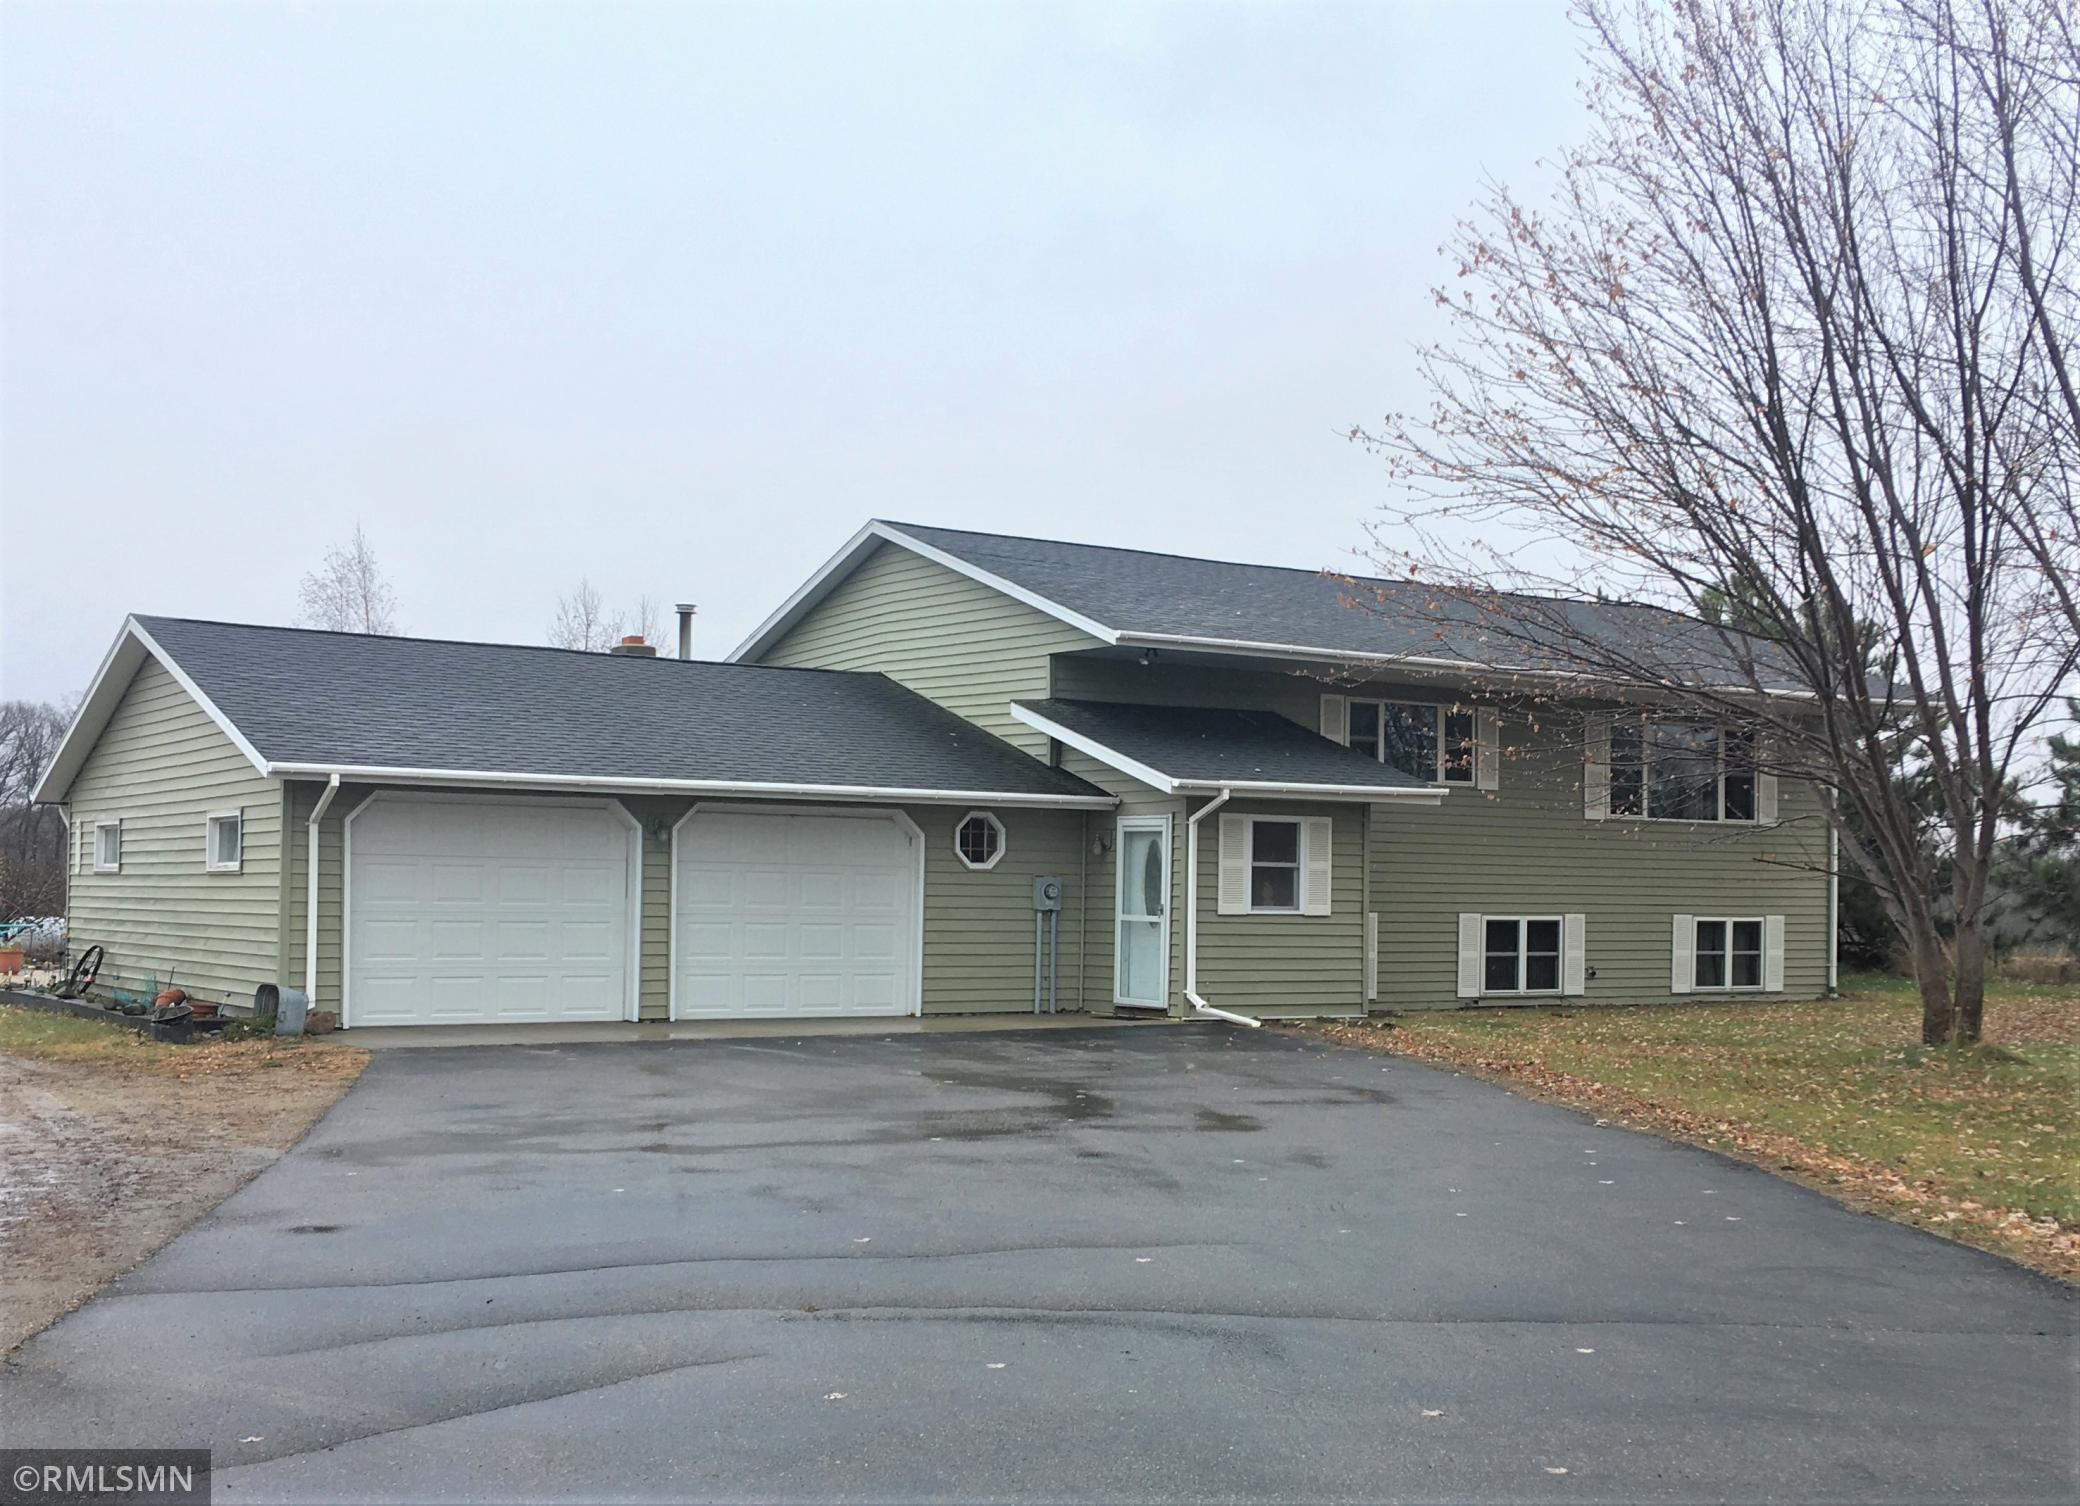 26660 US Highway 71 Property Photo - Sebeka, MN real estate listing